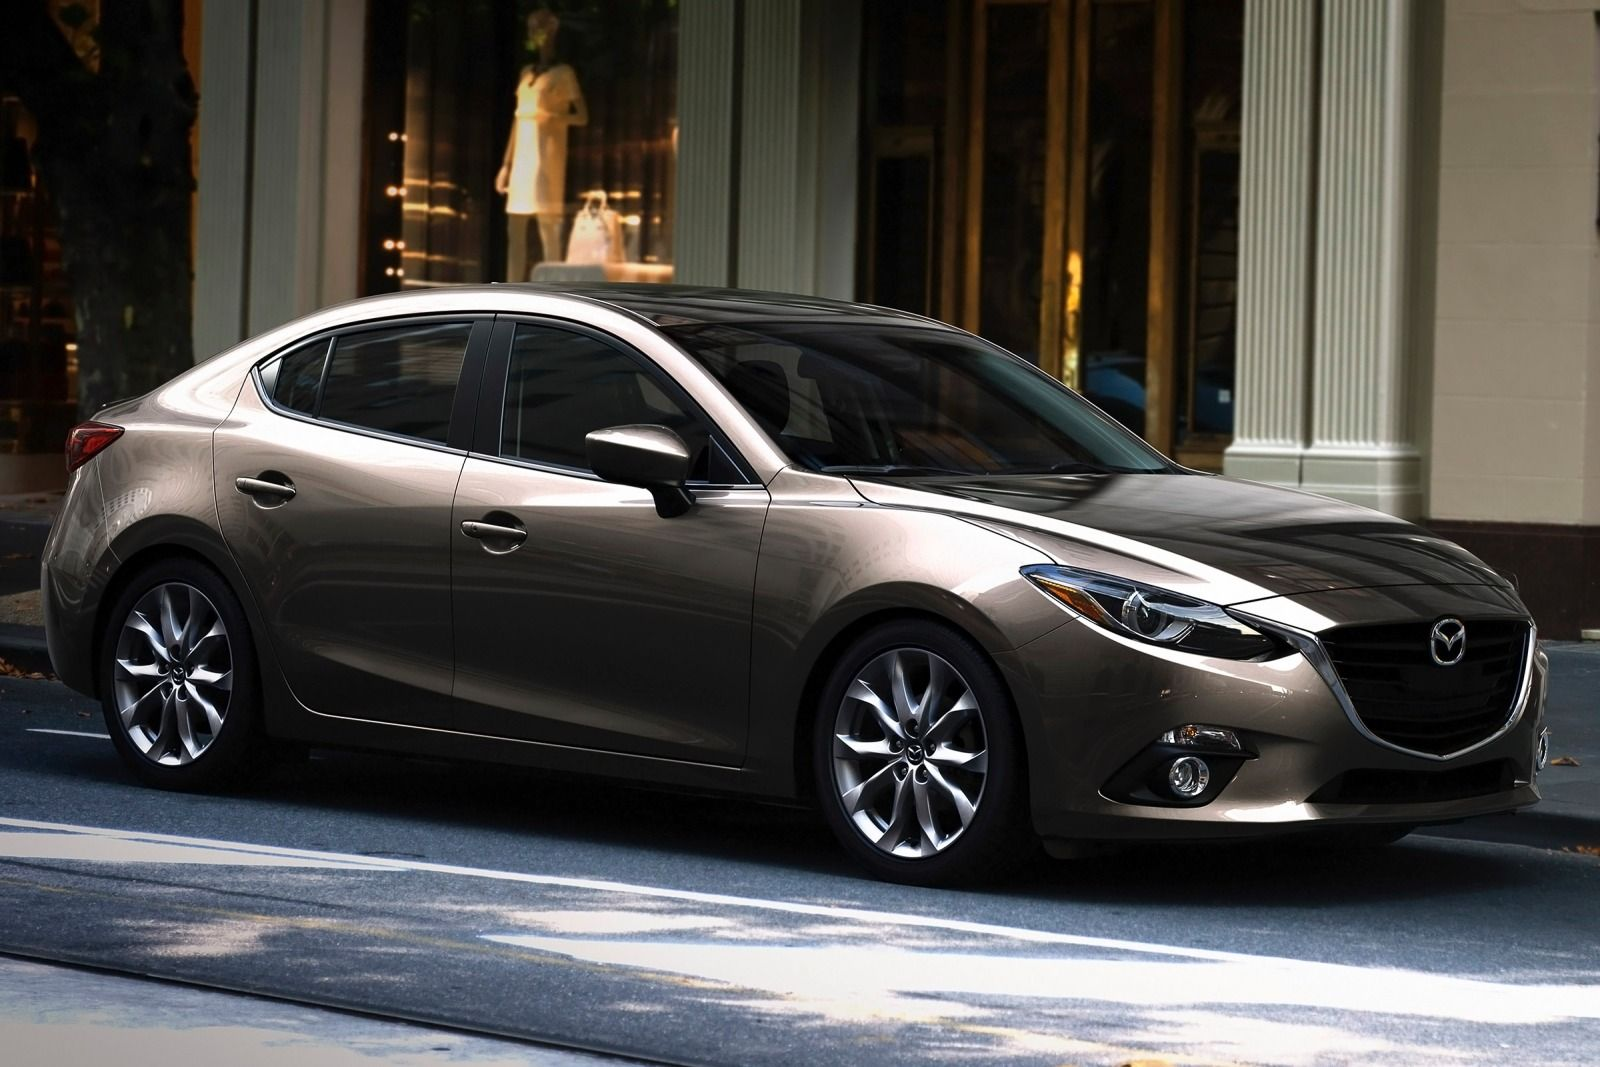 New 2015 Mazda 3 Hatchback #5605  Cars Performance